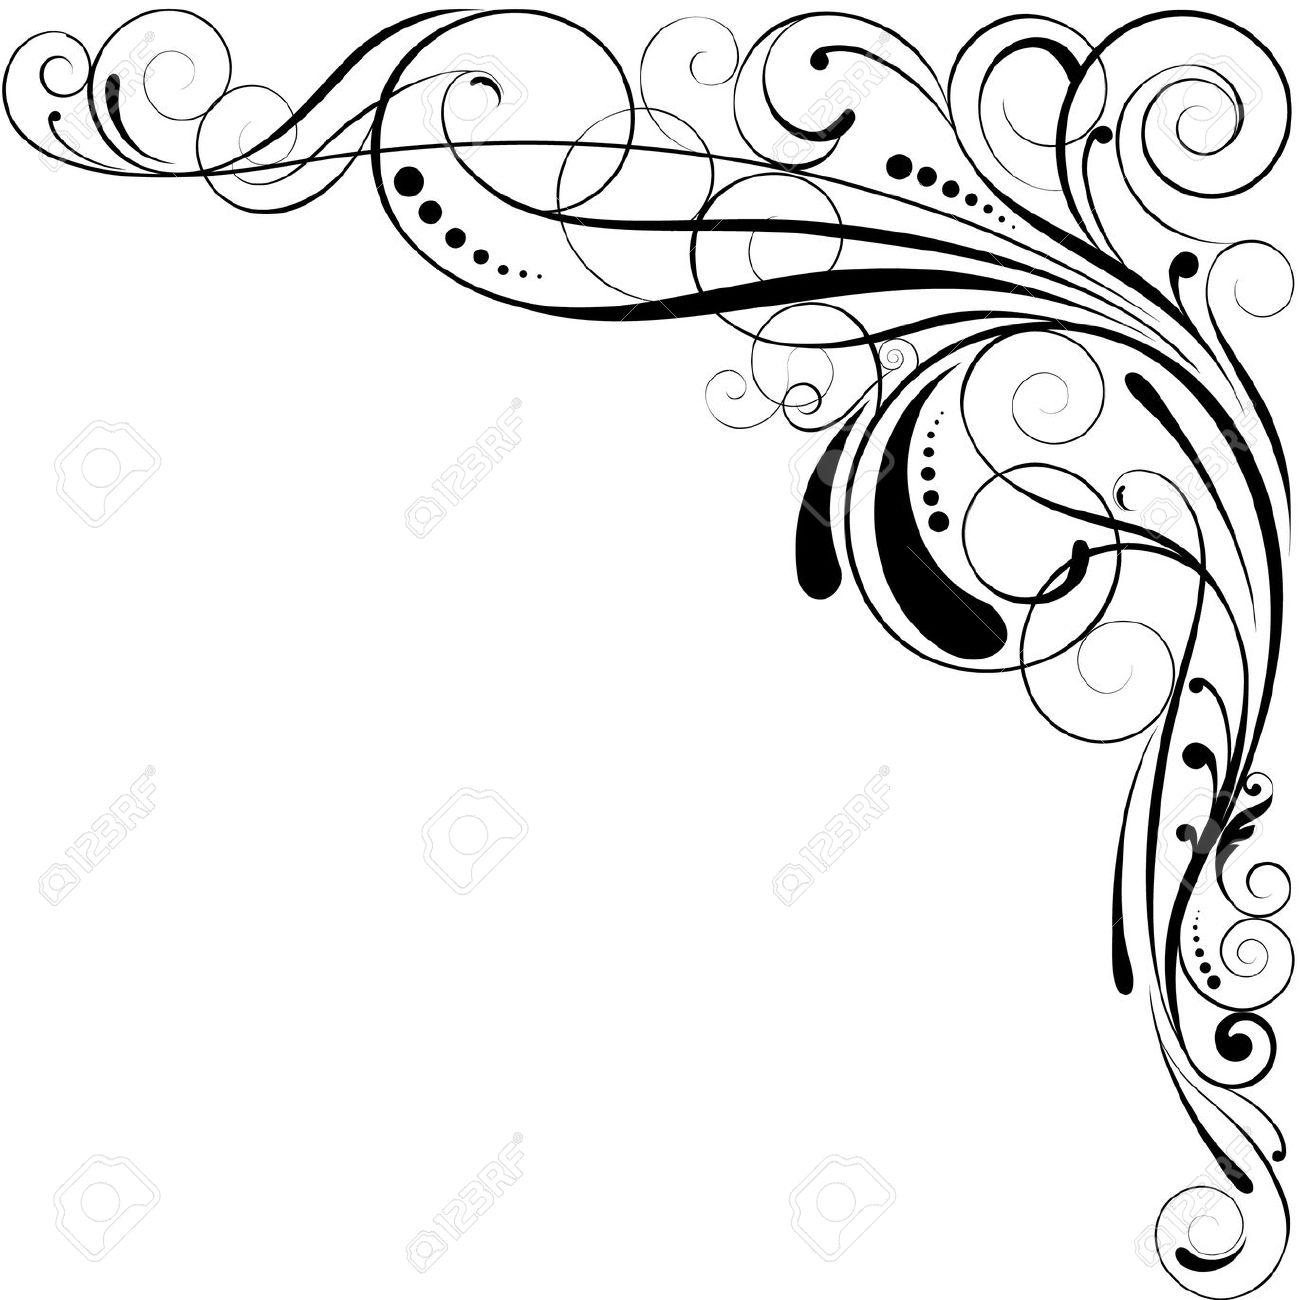 Lace clipart swirl. Filigree border free download